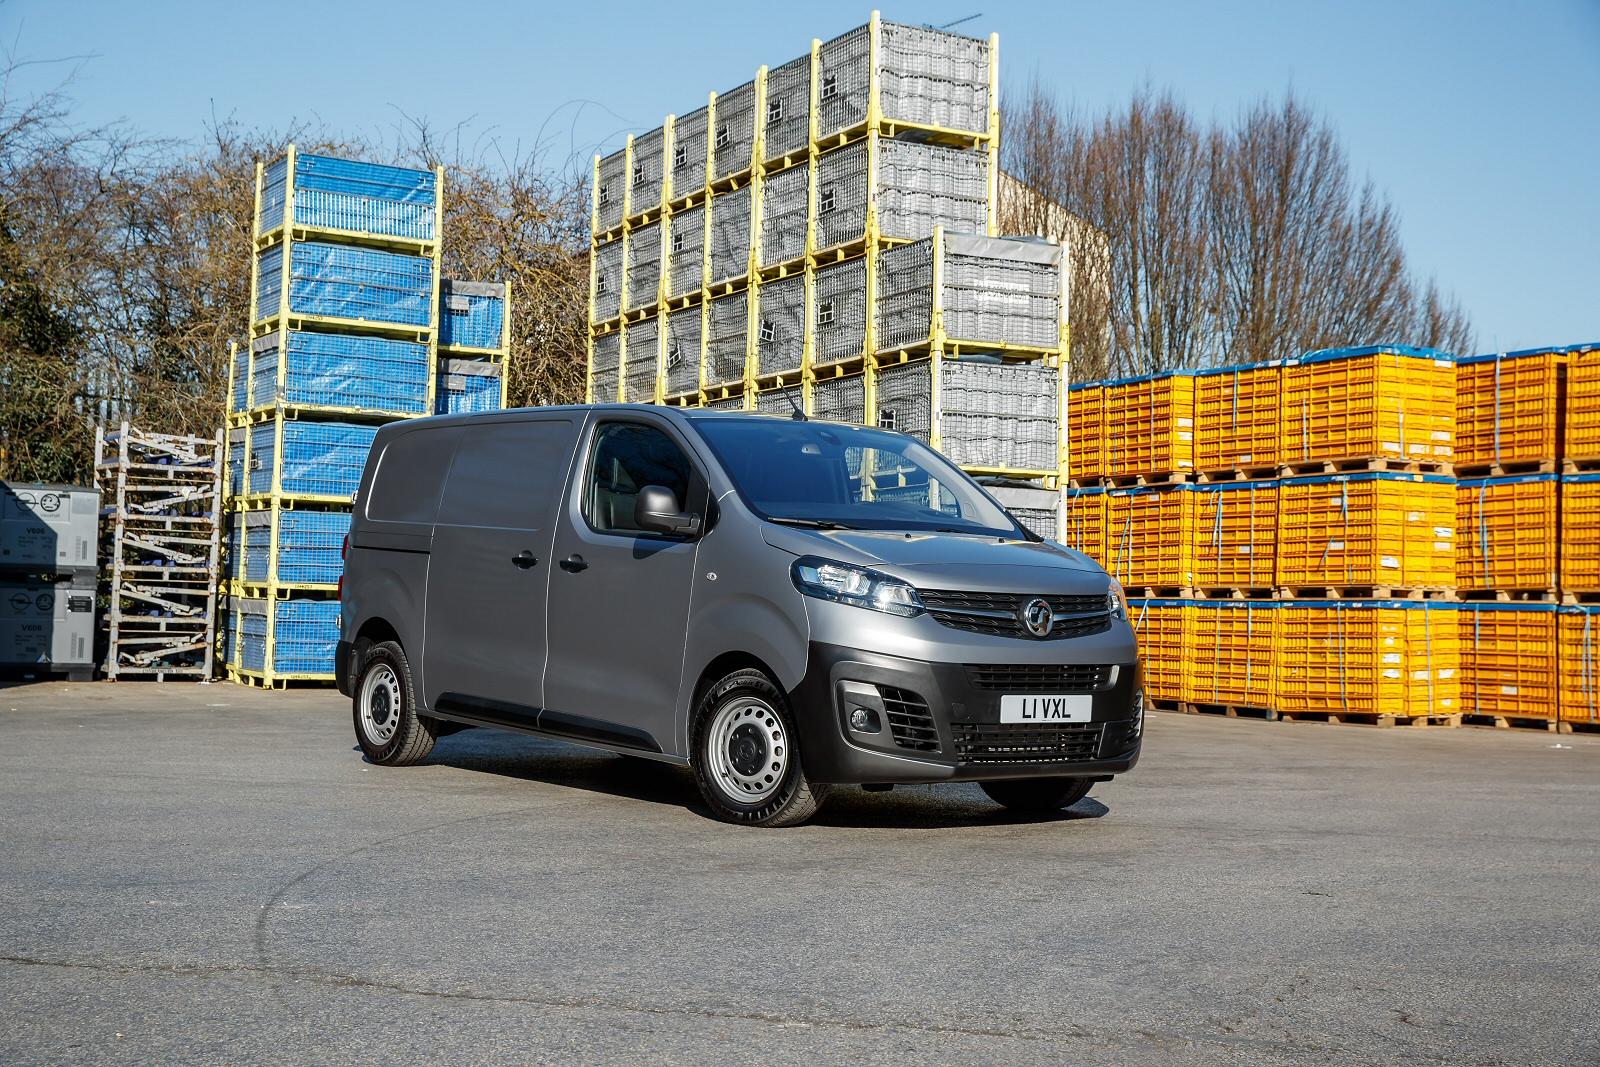 Vauxhall Vivaro L1 Diesel